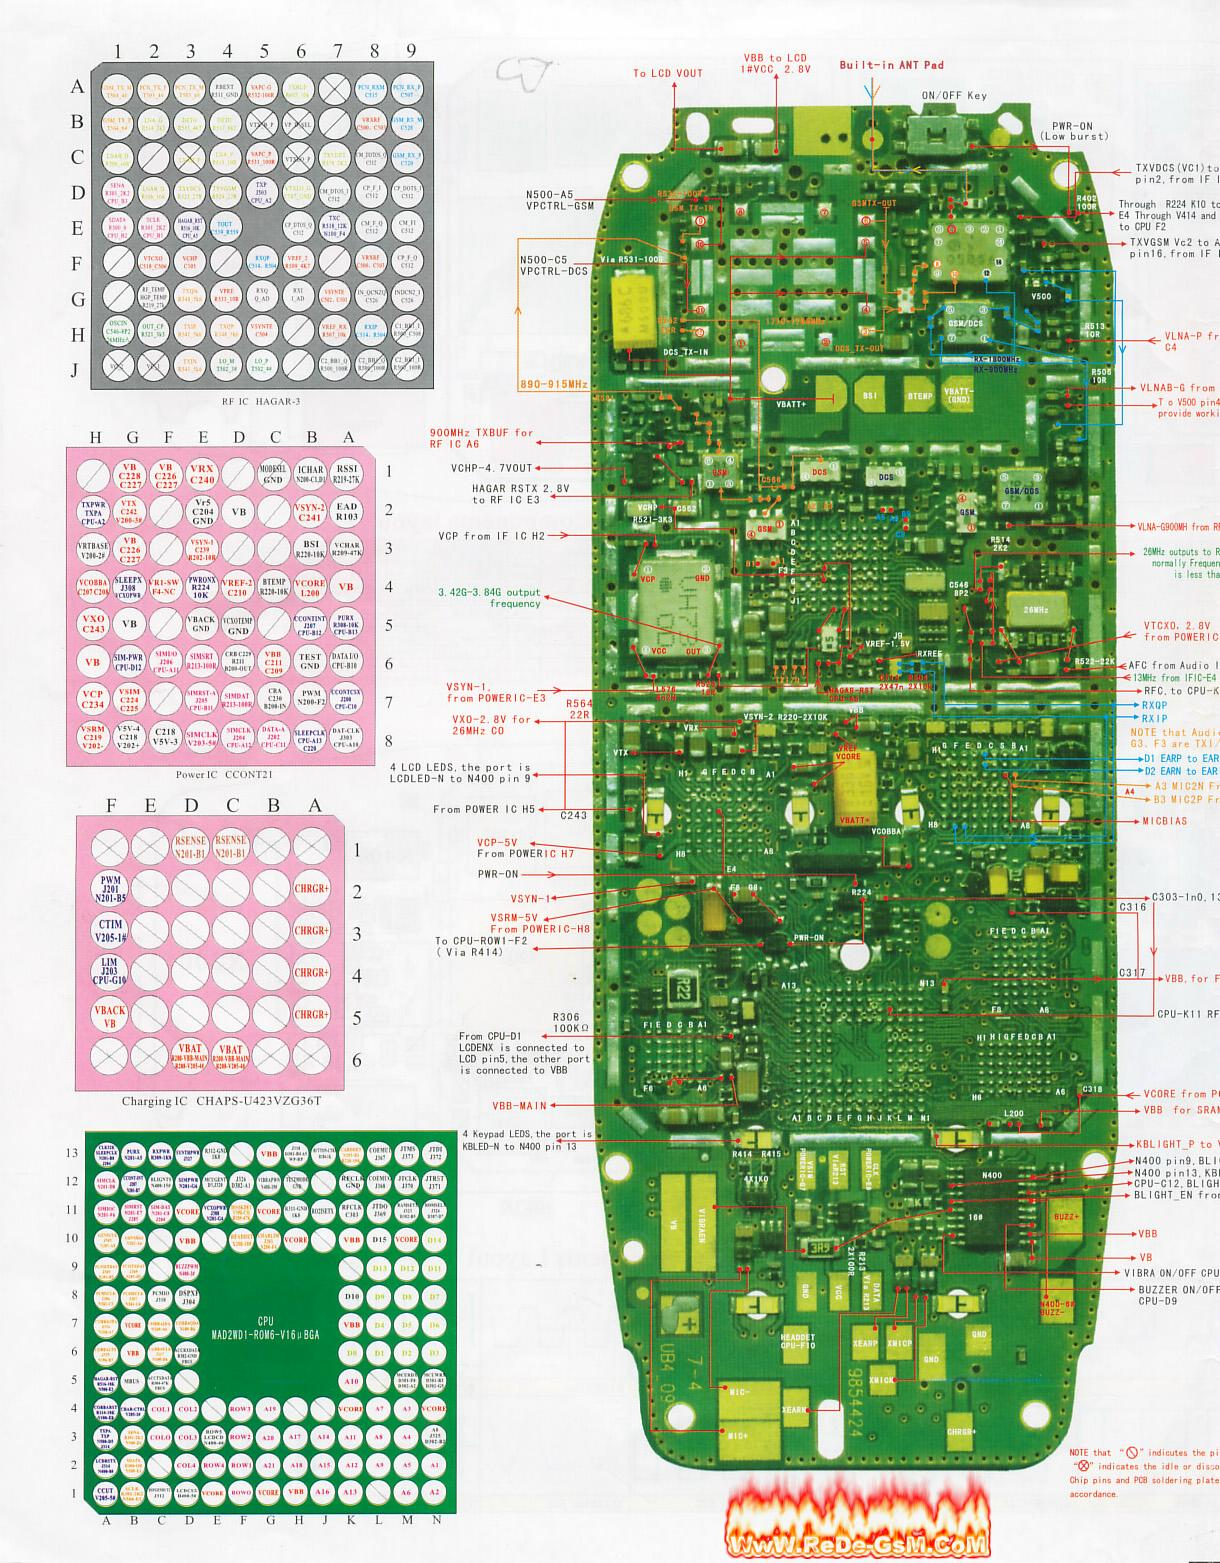 hight resolution of nokia 3310 schematics and diagrames 4g nokia 3310 circuit diagram nokia 3310